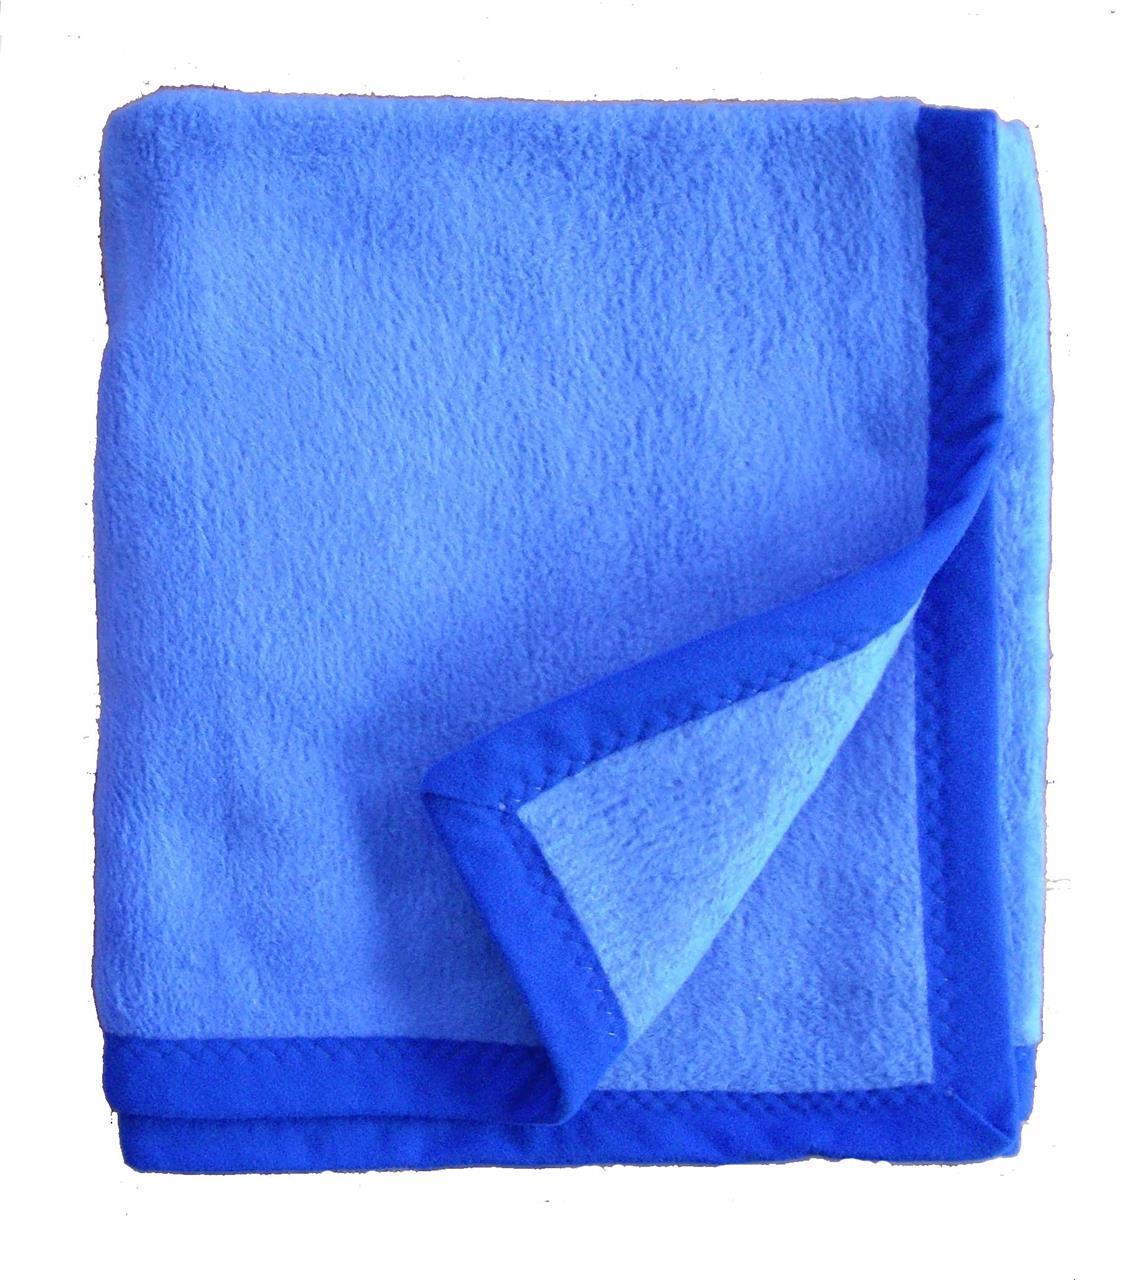 Enkel, blå